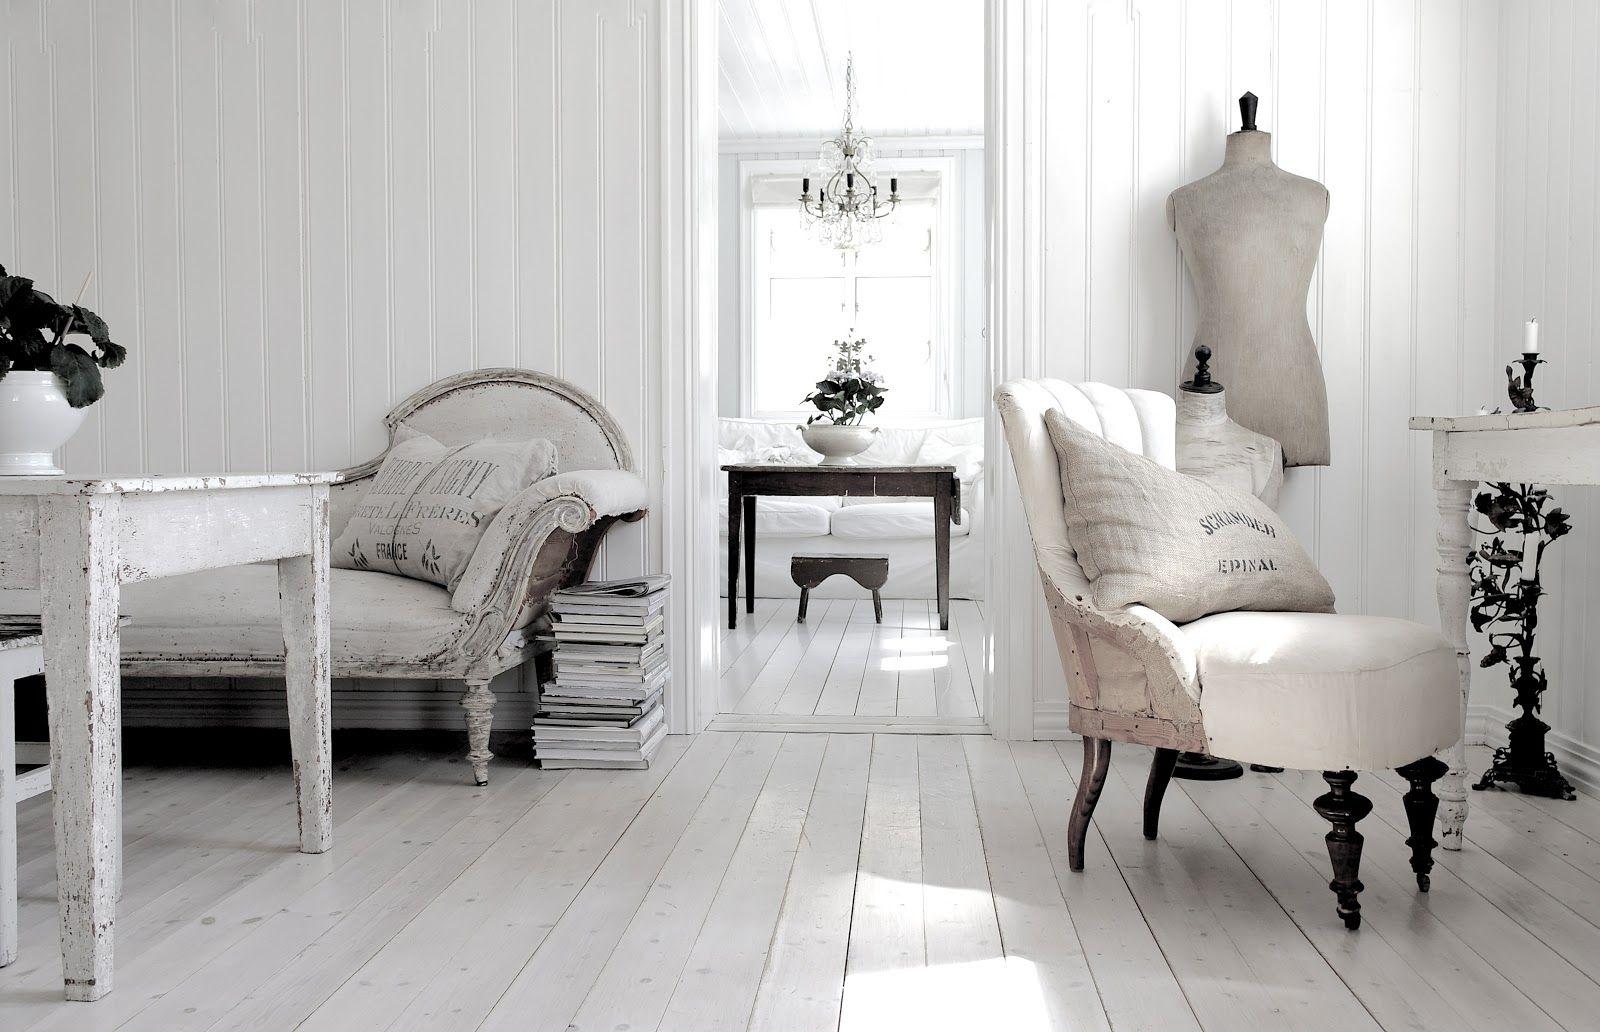 Beautiful Nordic living style Interior, Vintage interior